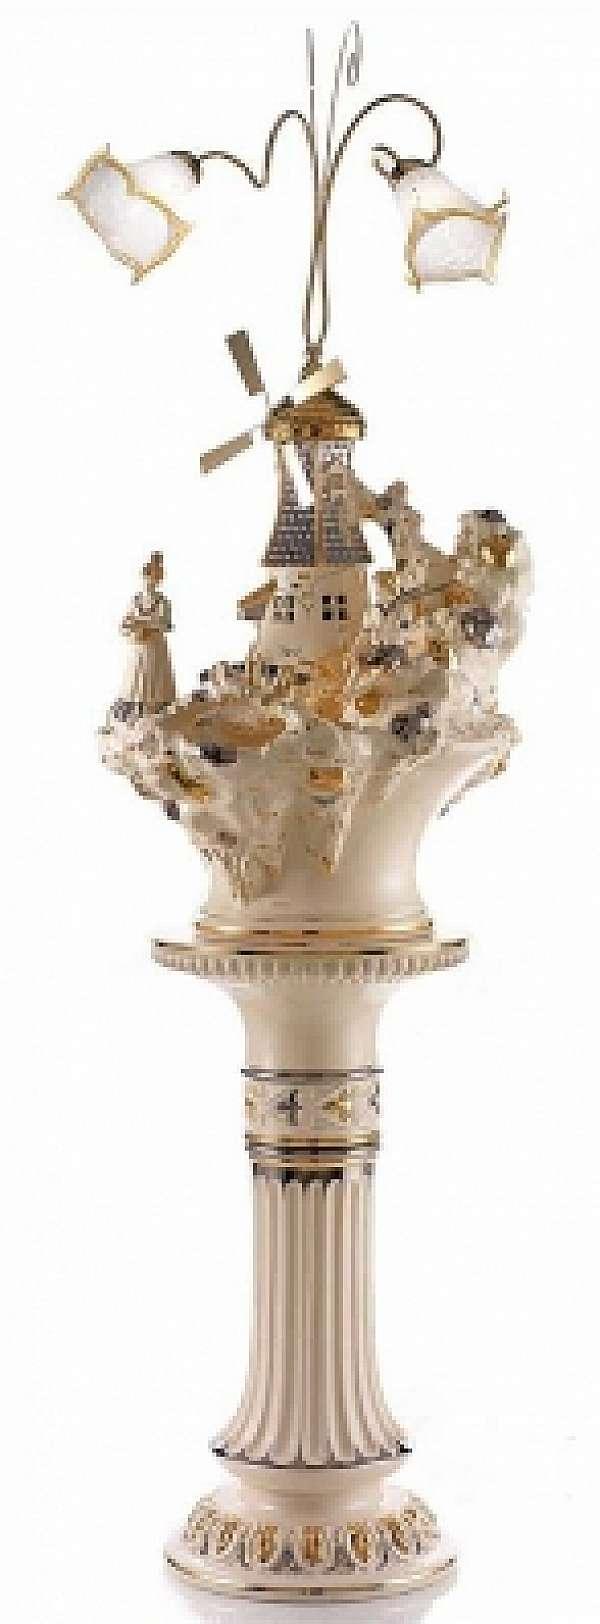 Напольная лампа LORENZON (F.LLI LORENZON) L.630/AVOPLF ARTE E CERAMICA